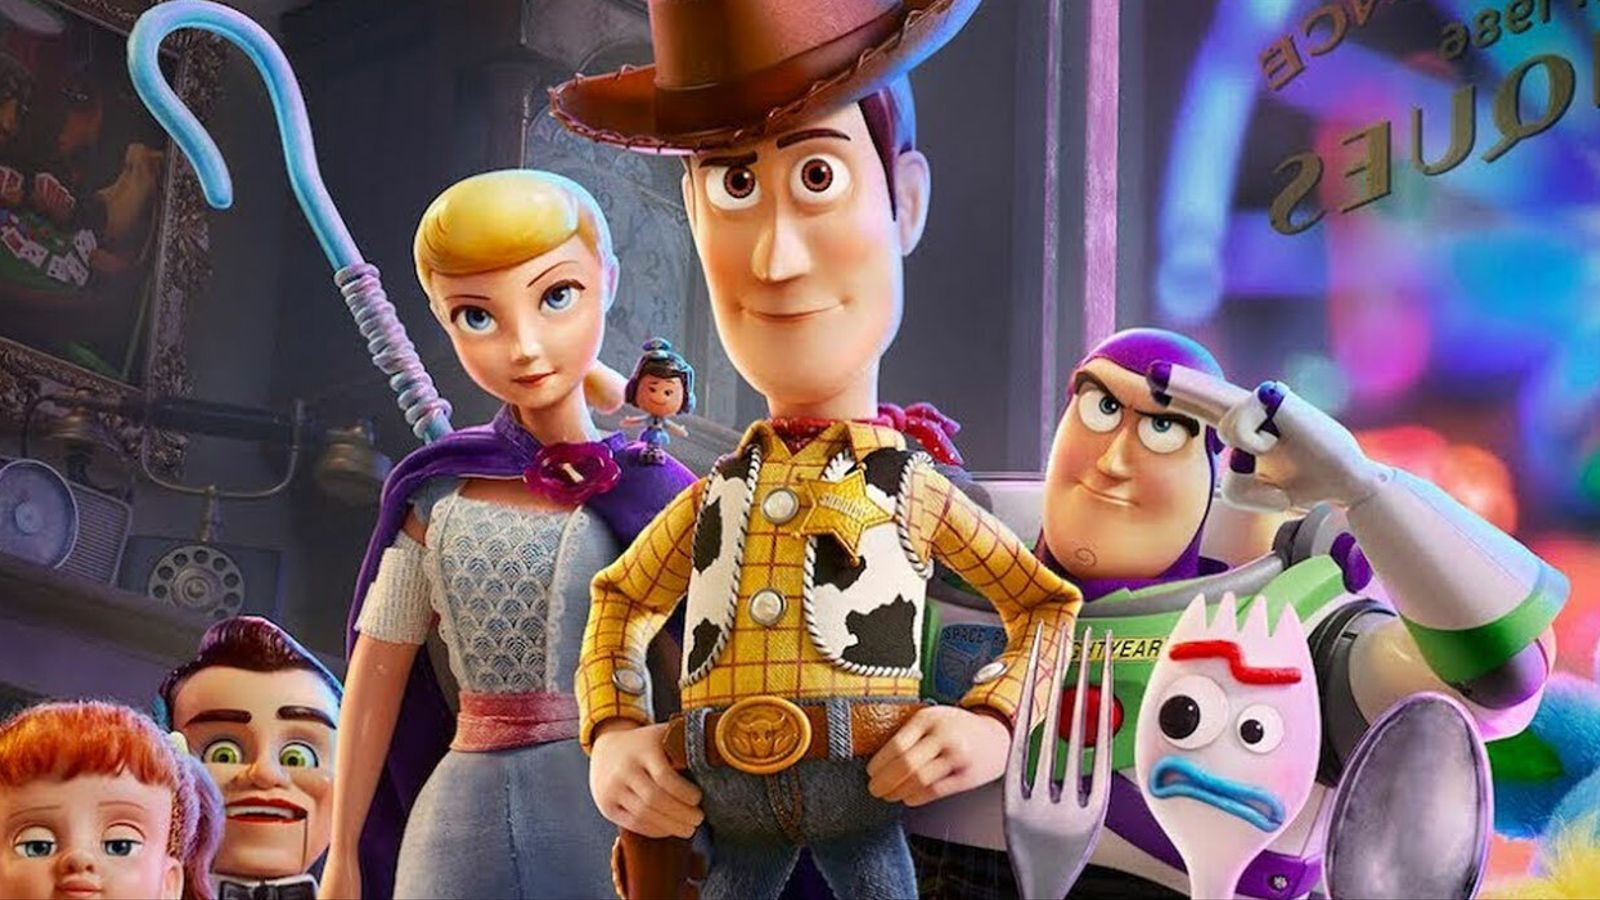 Arriba el tràiler oficial de 'Toy Story 4'